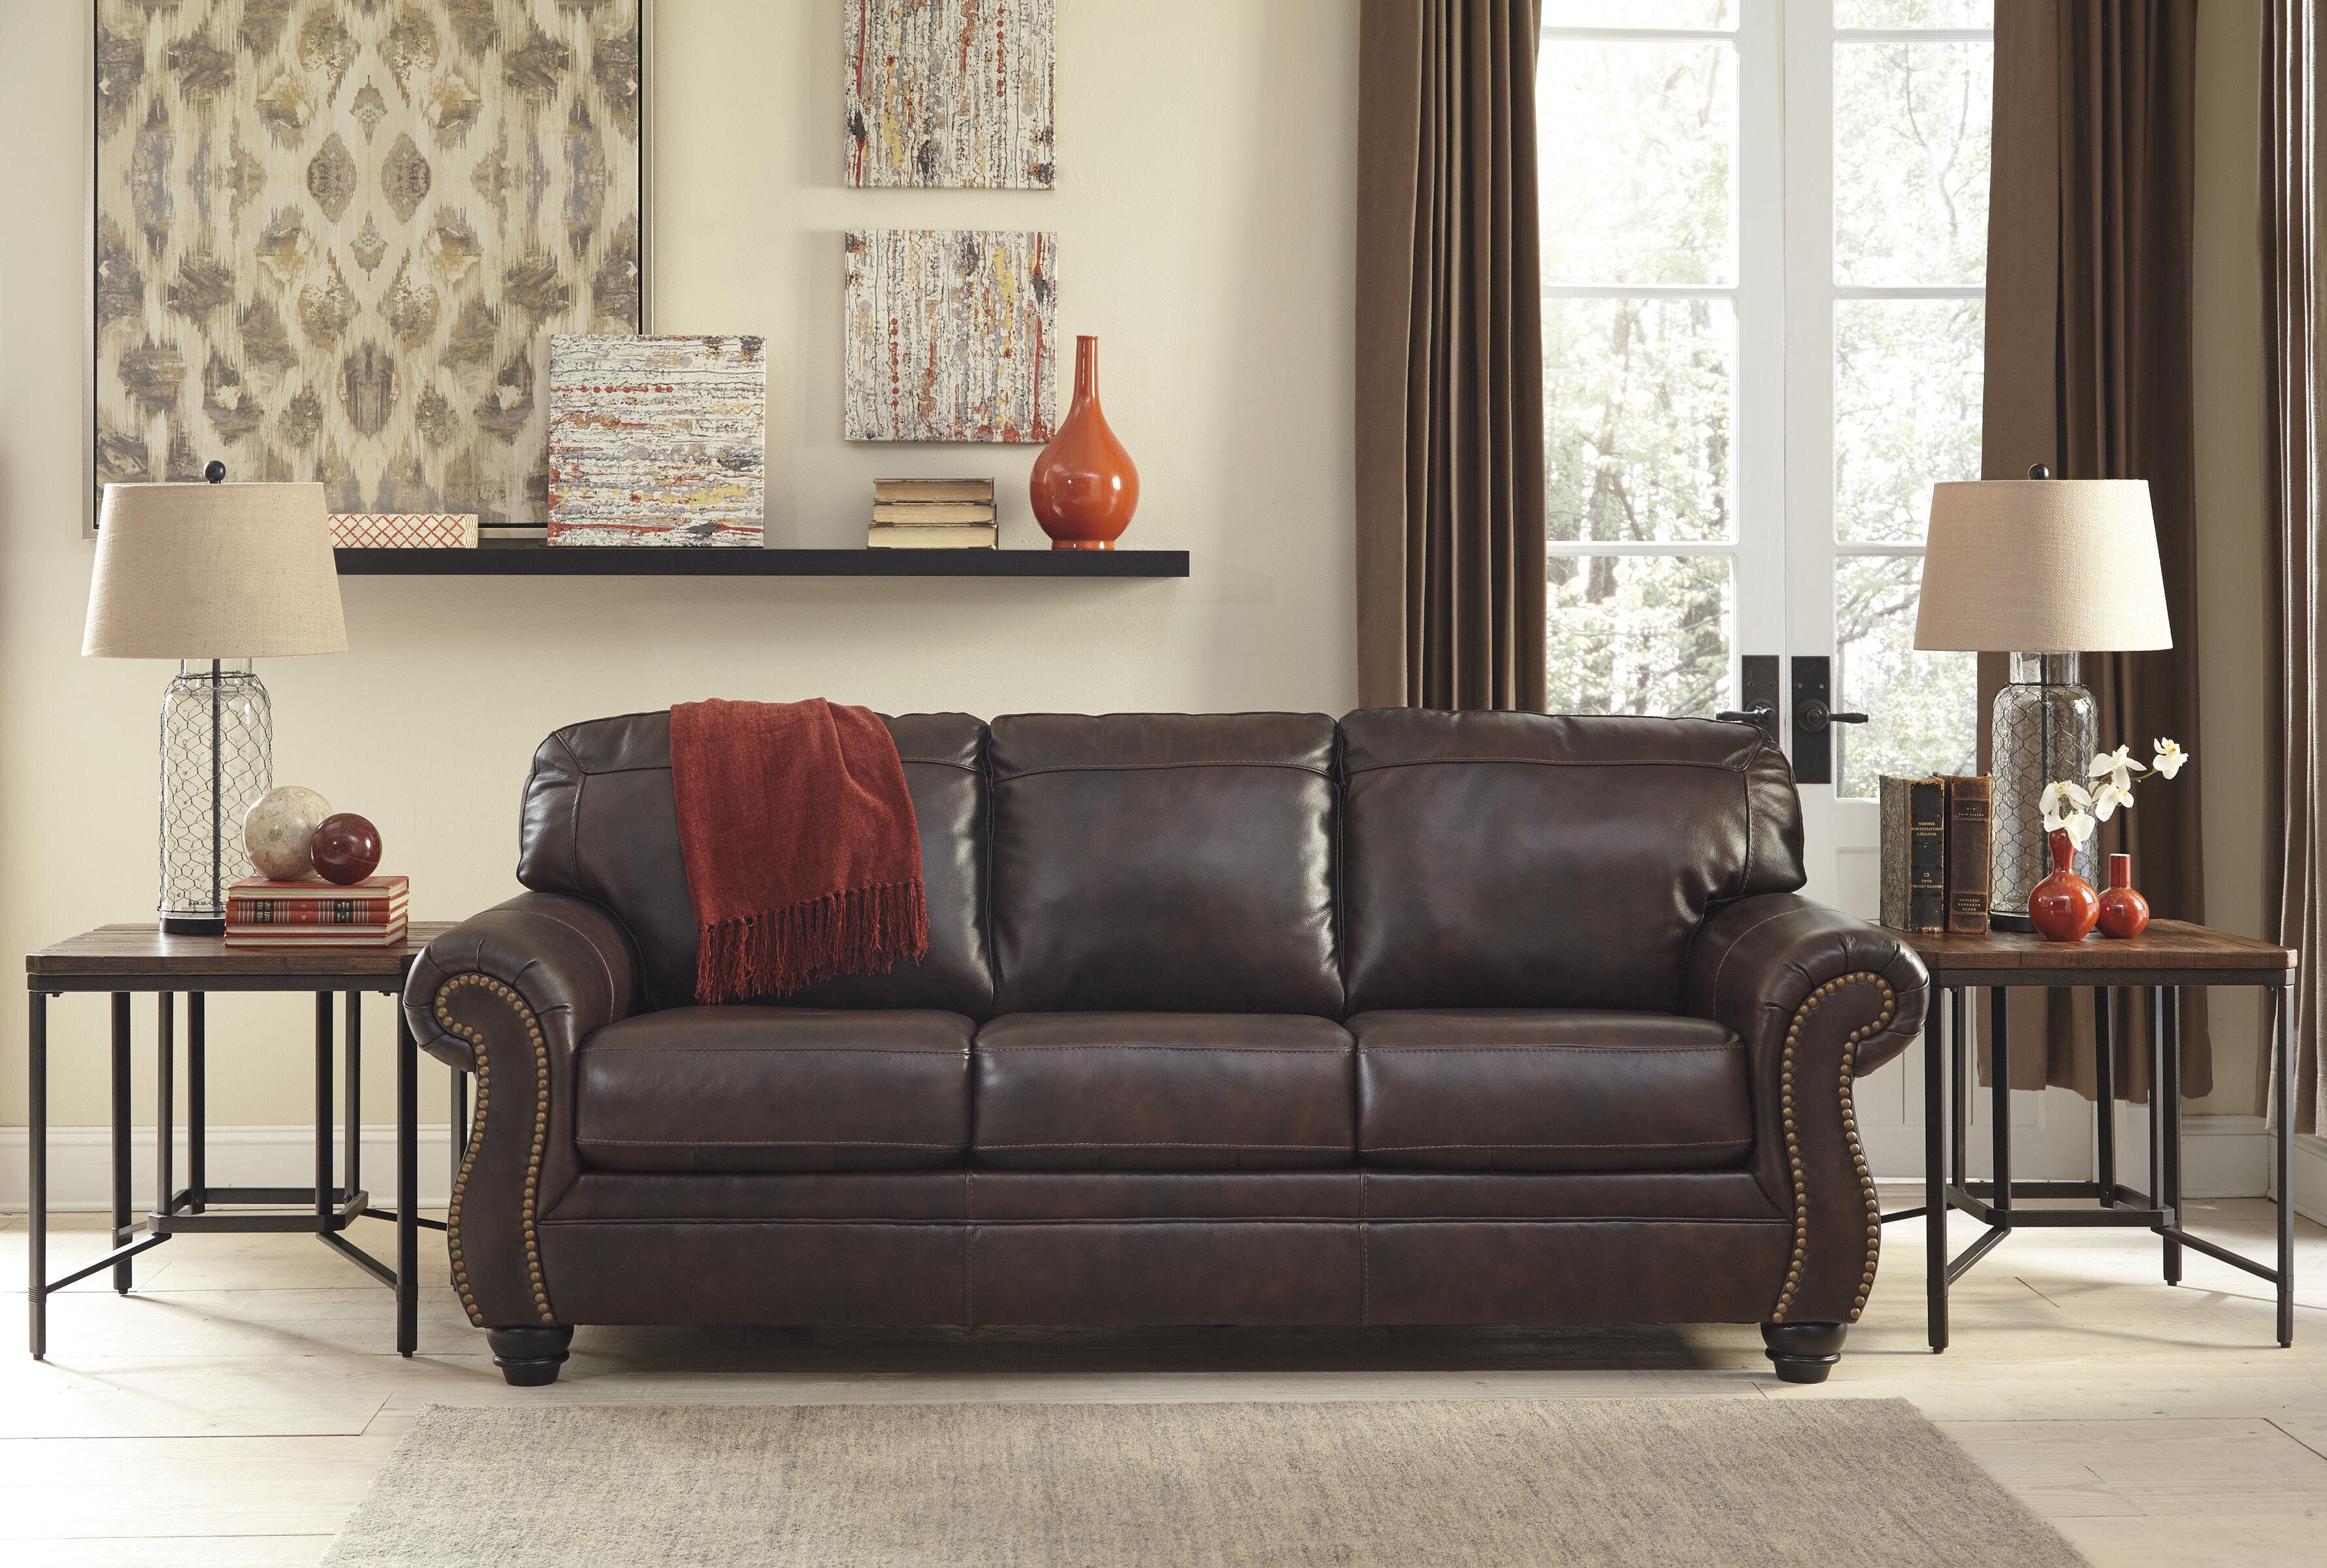 ... Traditional Rolled Arm 89u0026quot; Sofa In Walnut